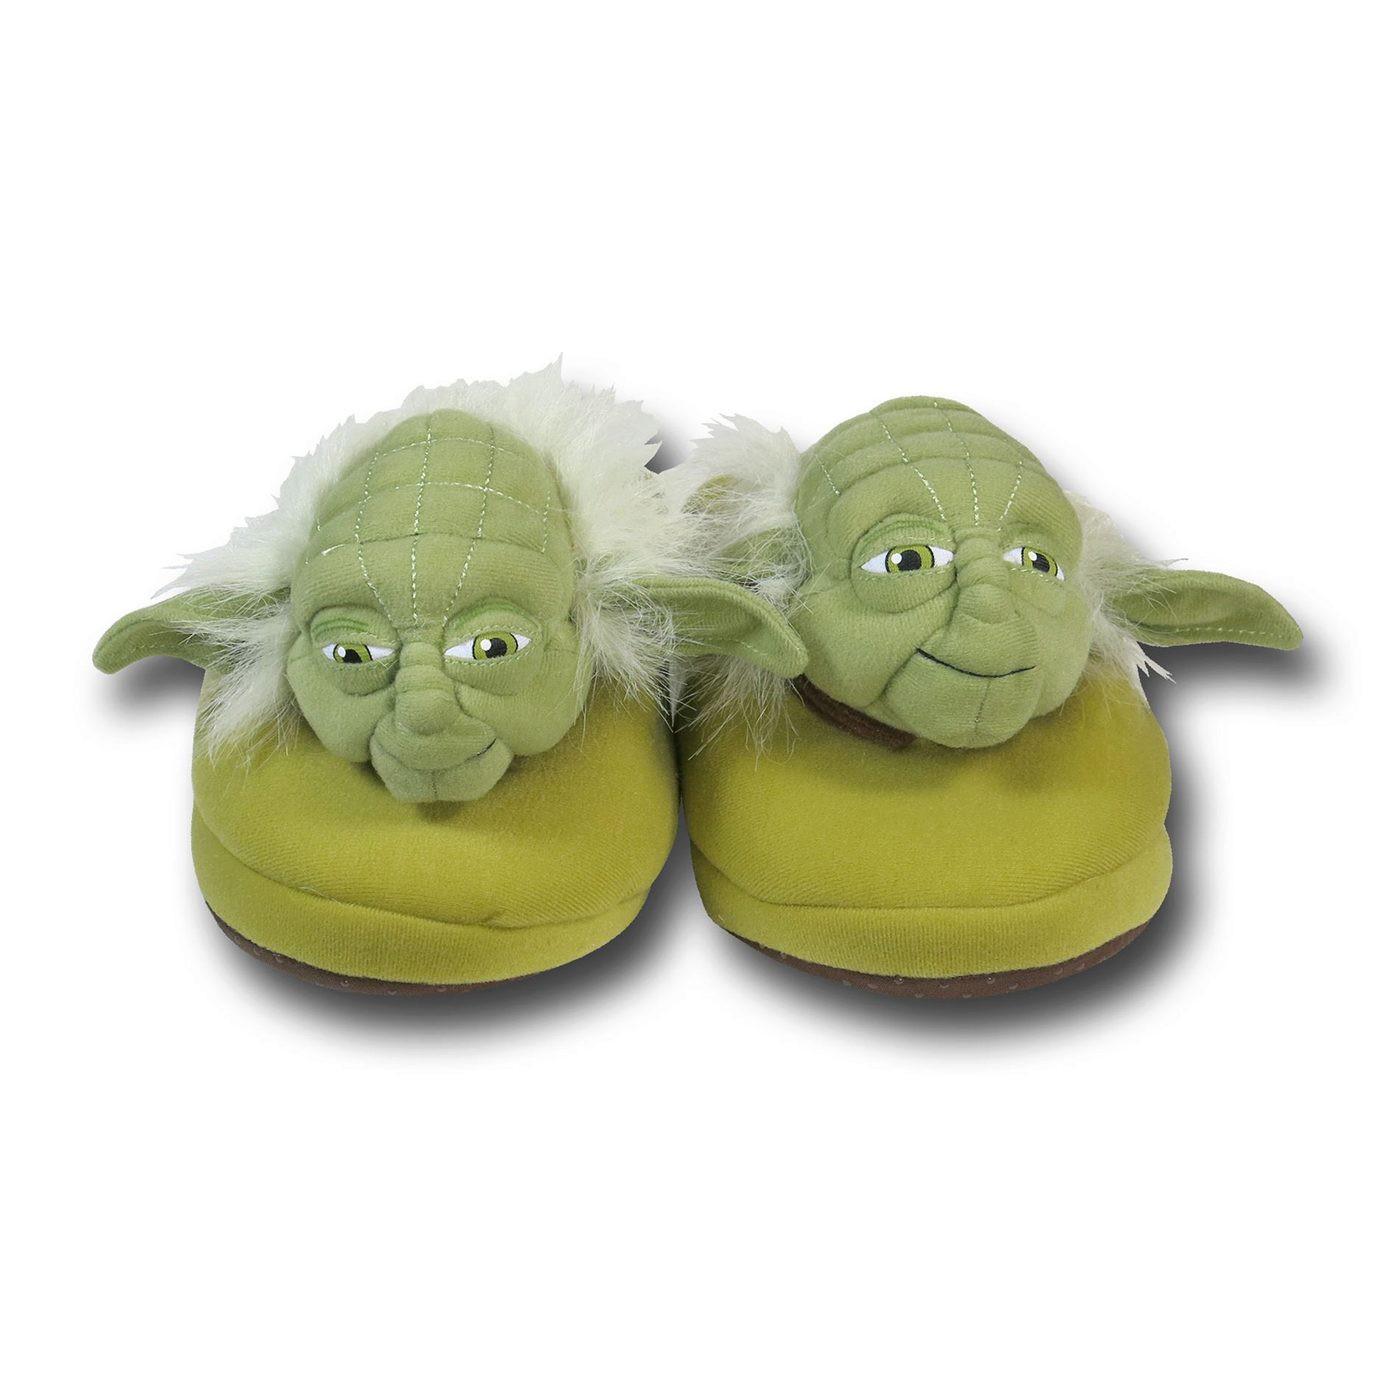 Star Wars Yoda Slippers